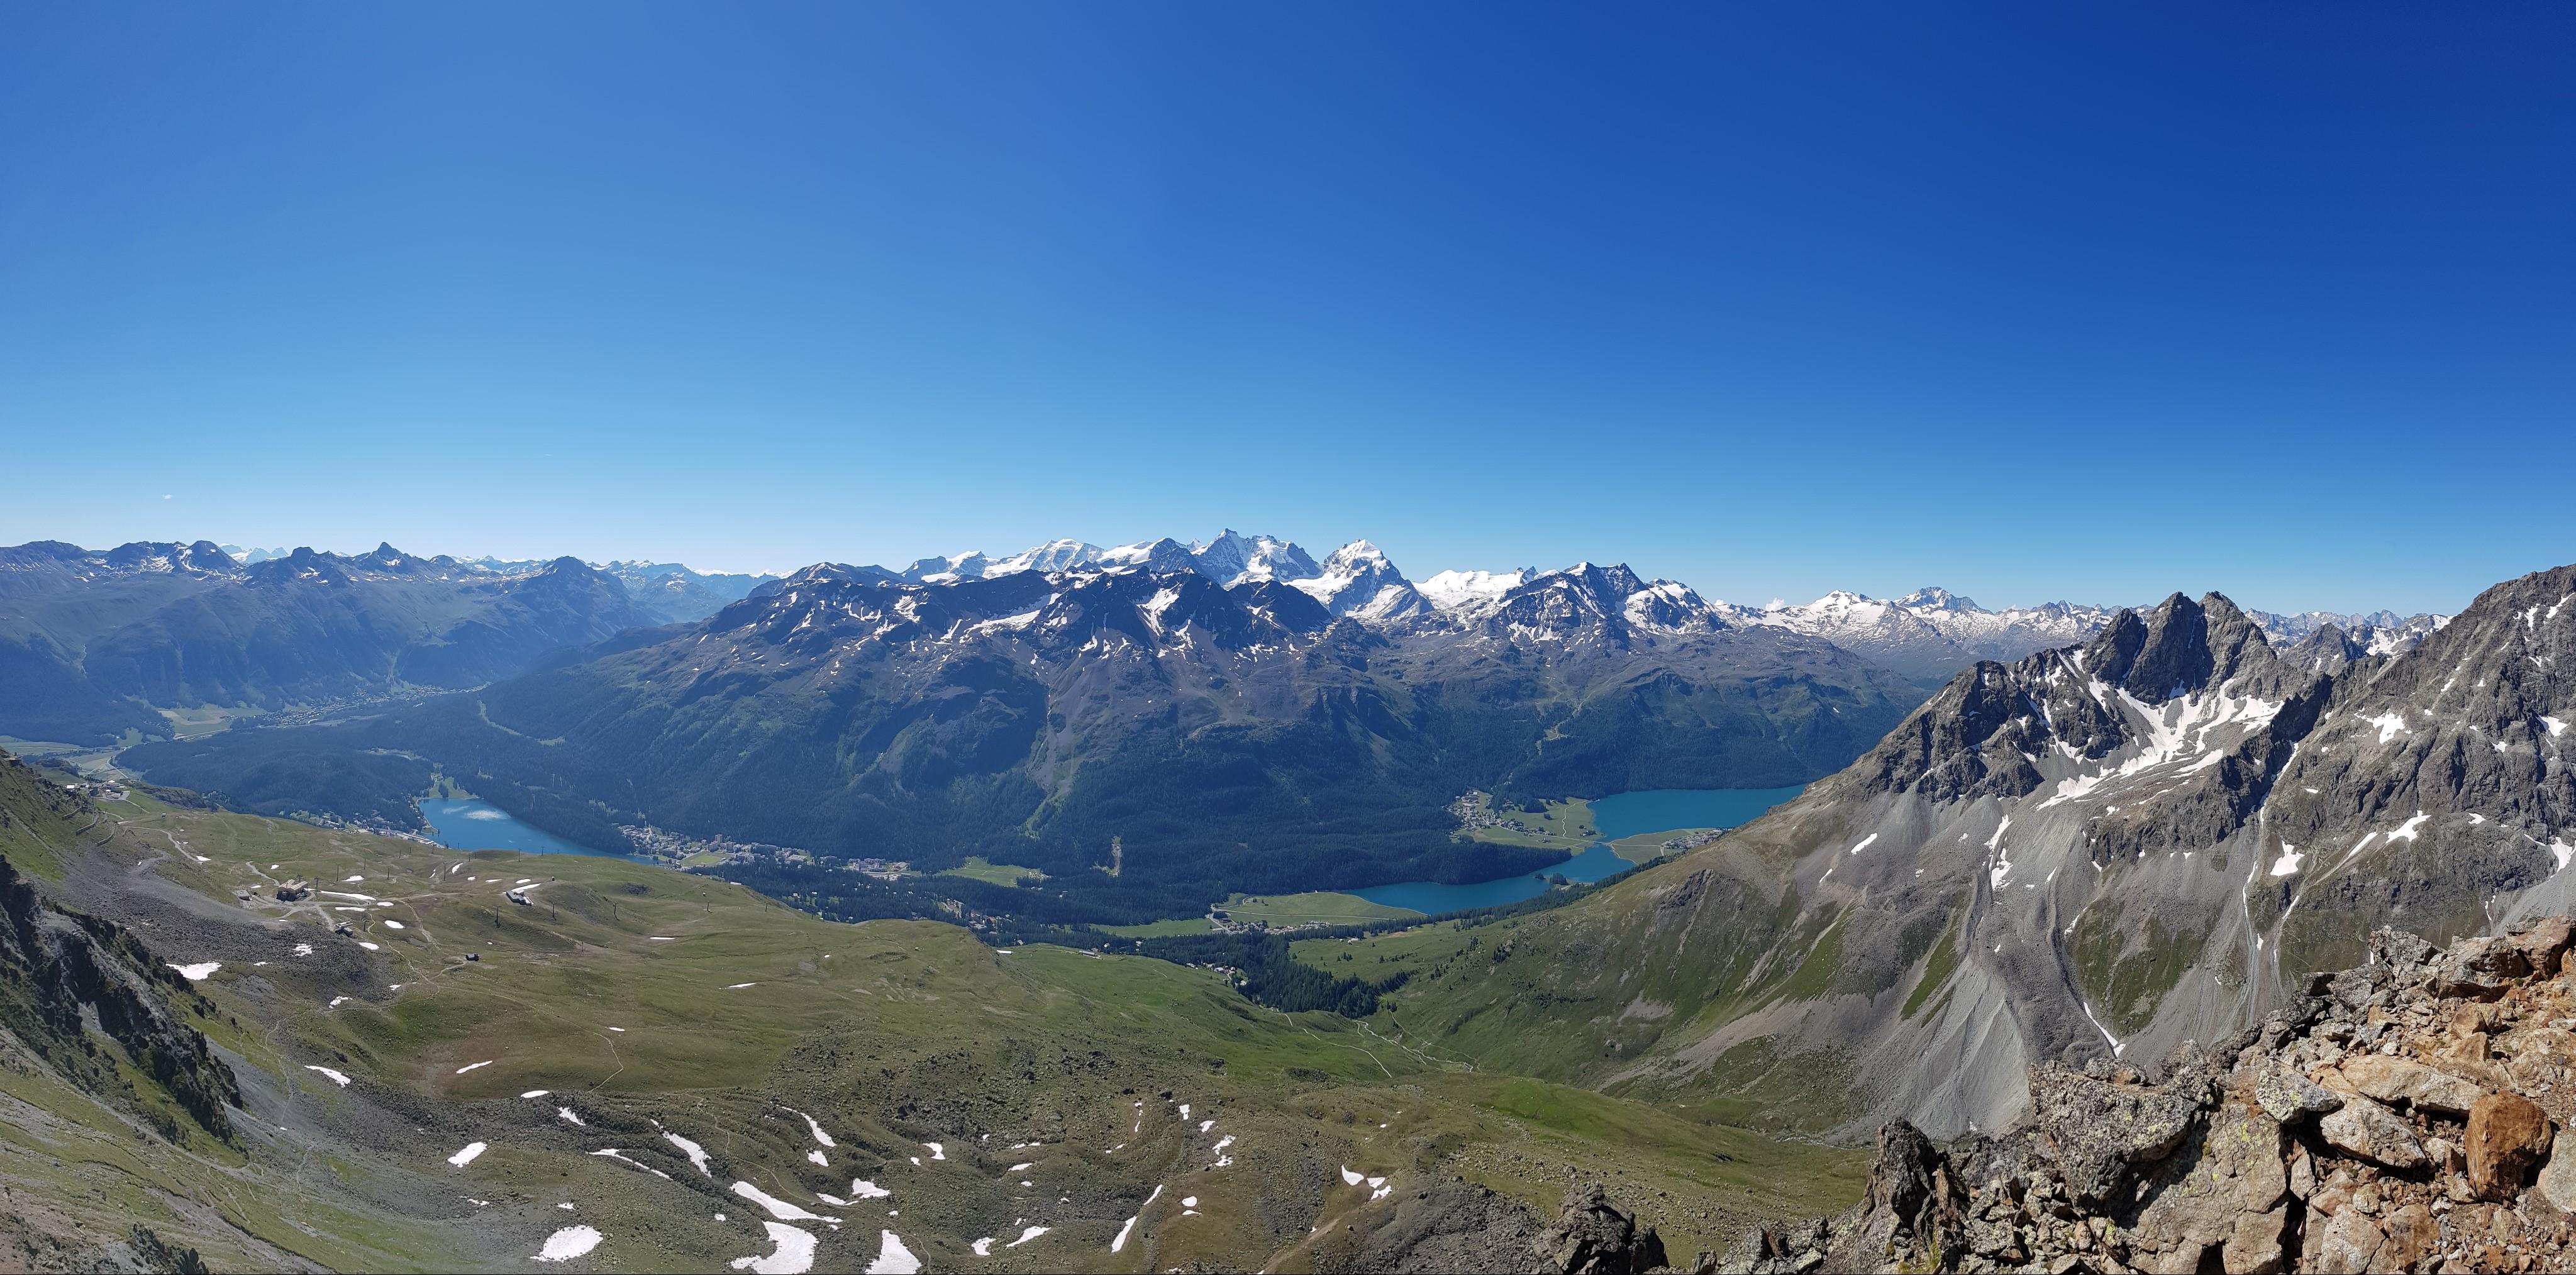 Engadine, St. Moritz, Piz Nair, view in direction Piz Bernina, Piz Murtel, Piz Corvatsch, Lake of St. Moritz, Lake Champfer, Lake Silvaplana